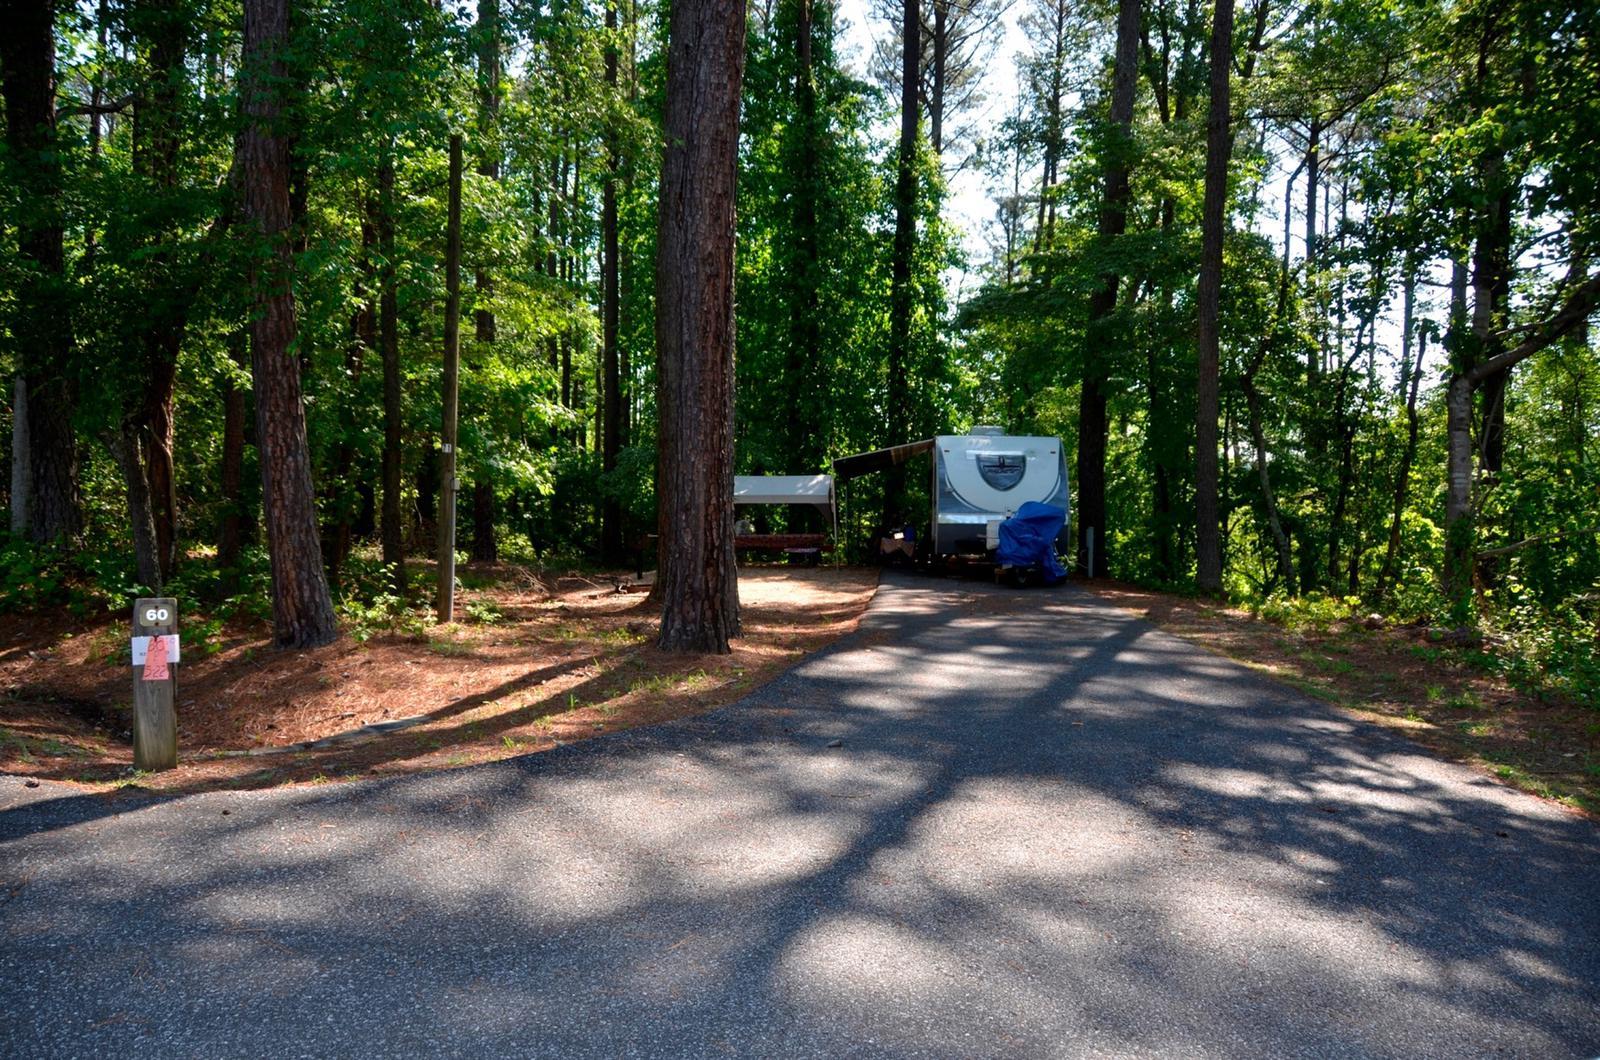 Driveway slopePayne Campground, campsite #60